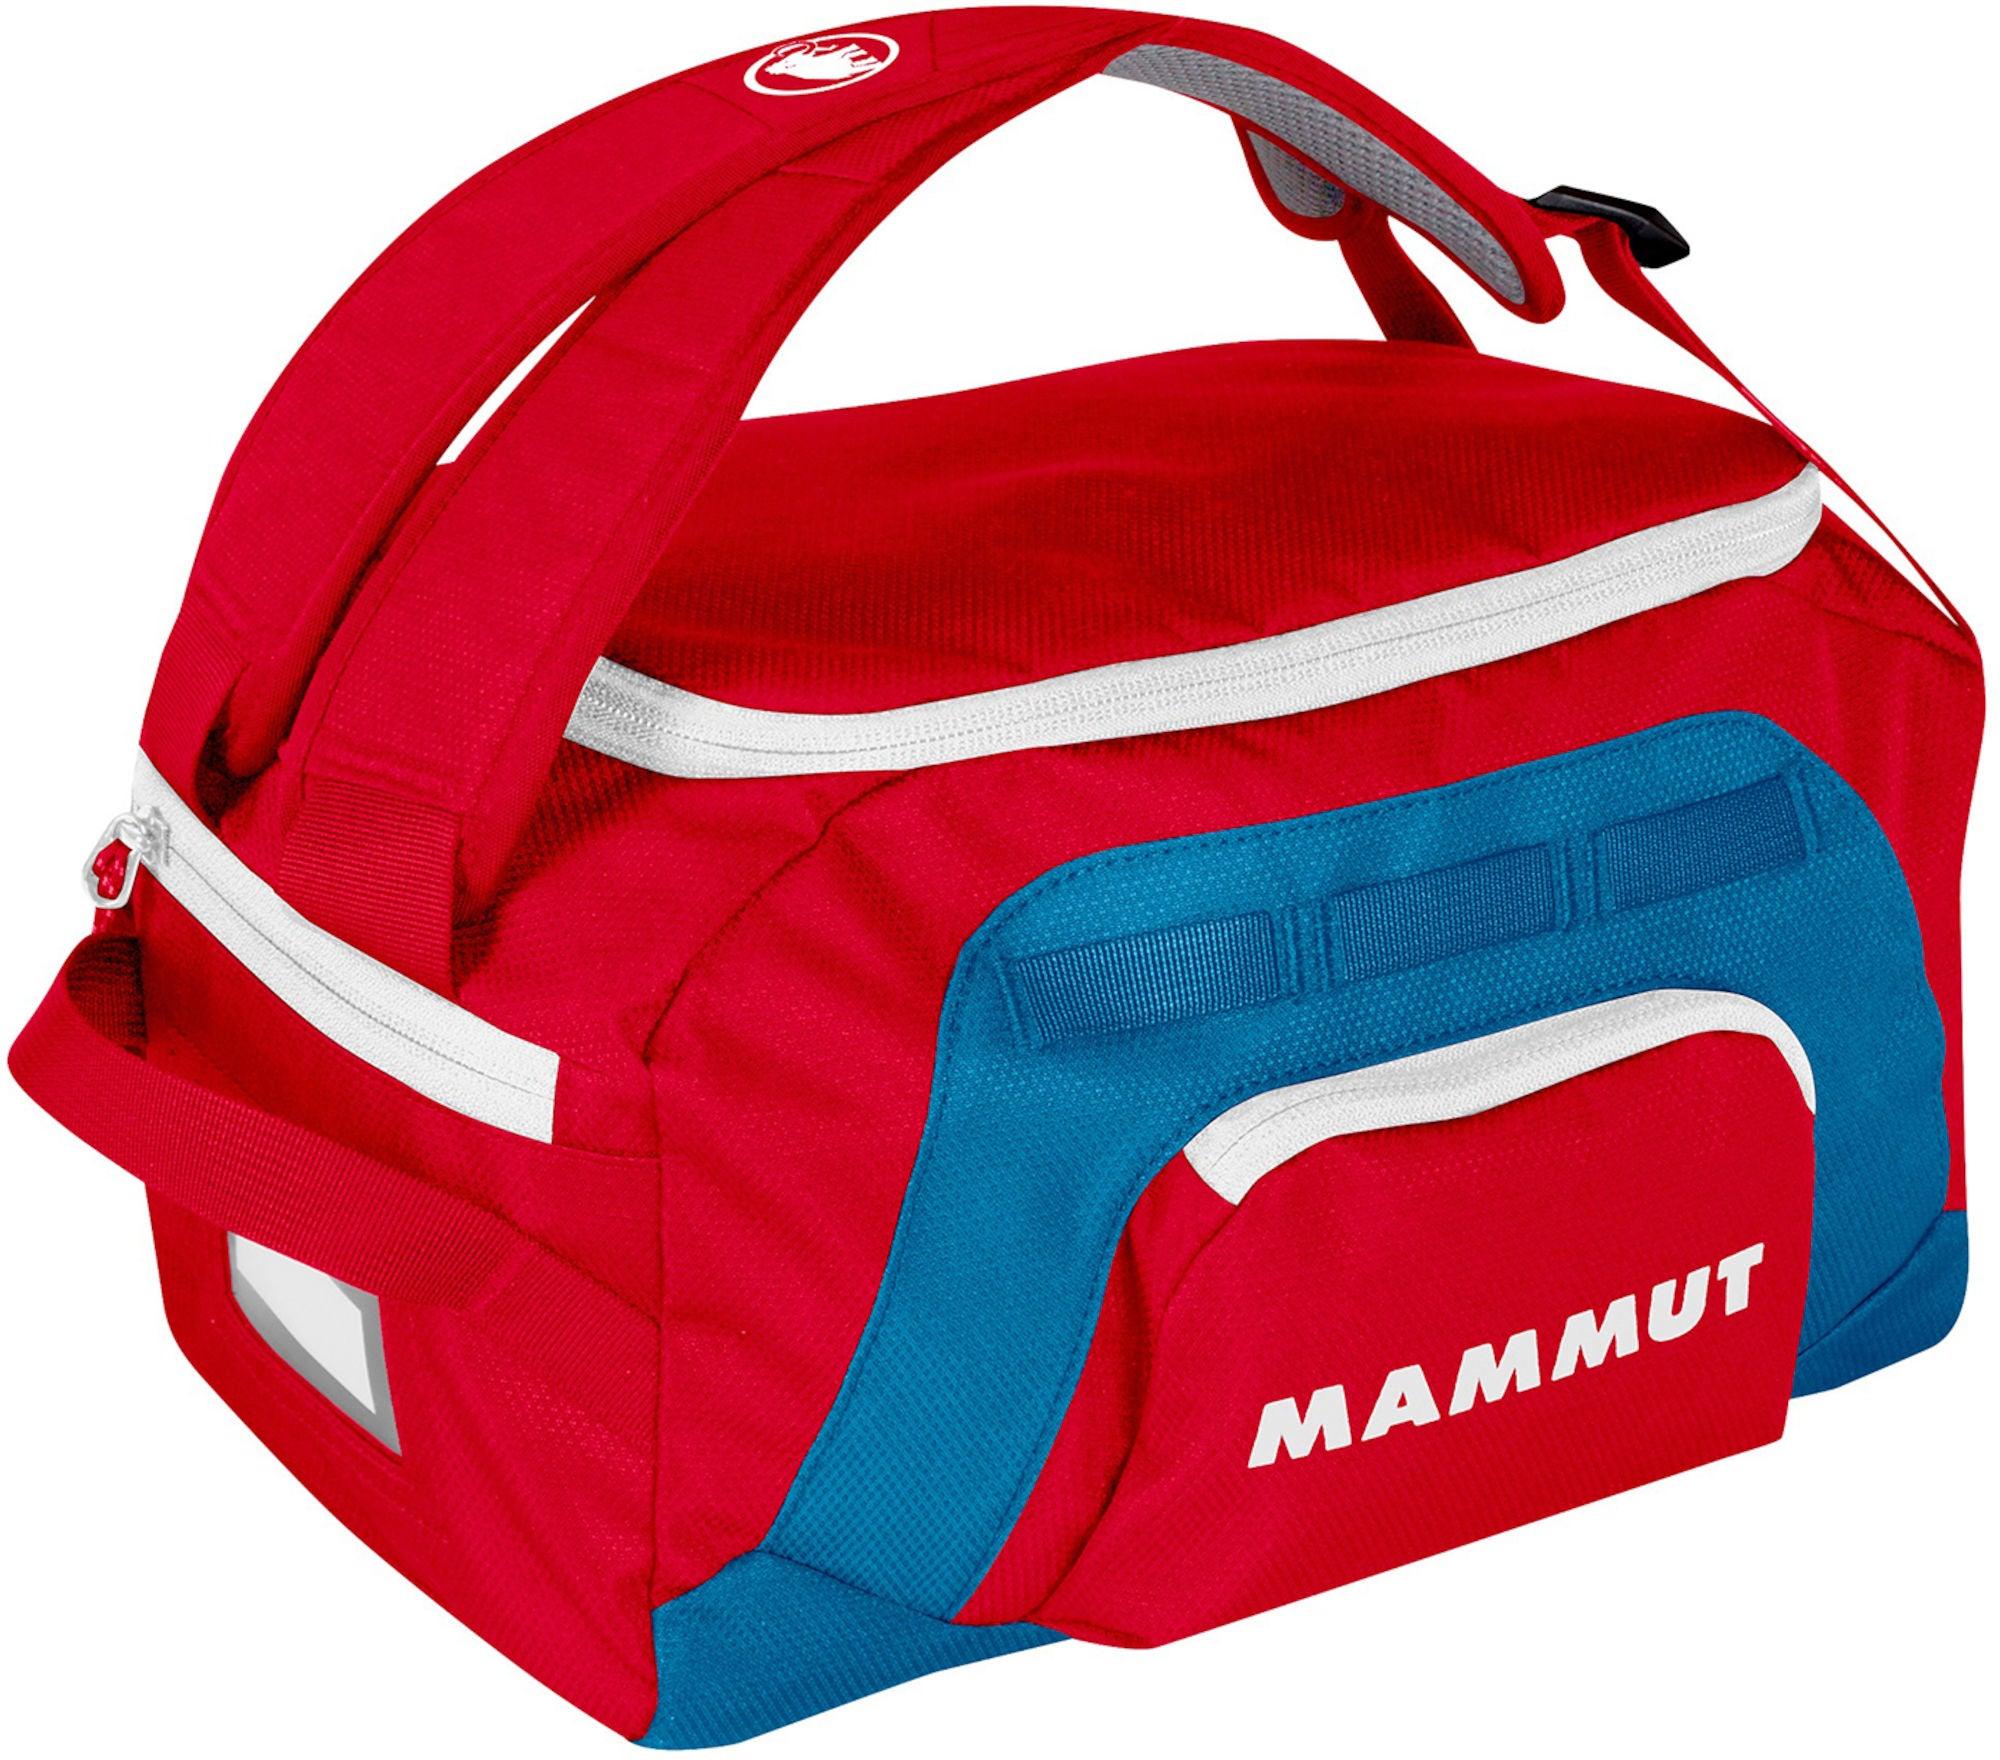 Mammut First Cargo Duffel Bag 18L, Imperial Inferno